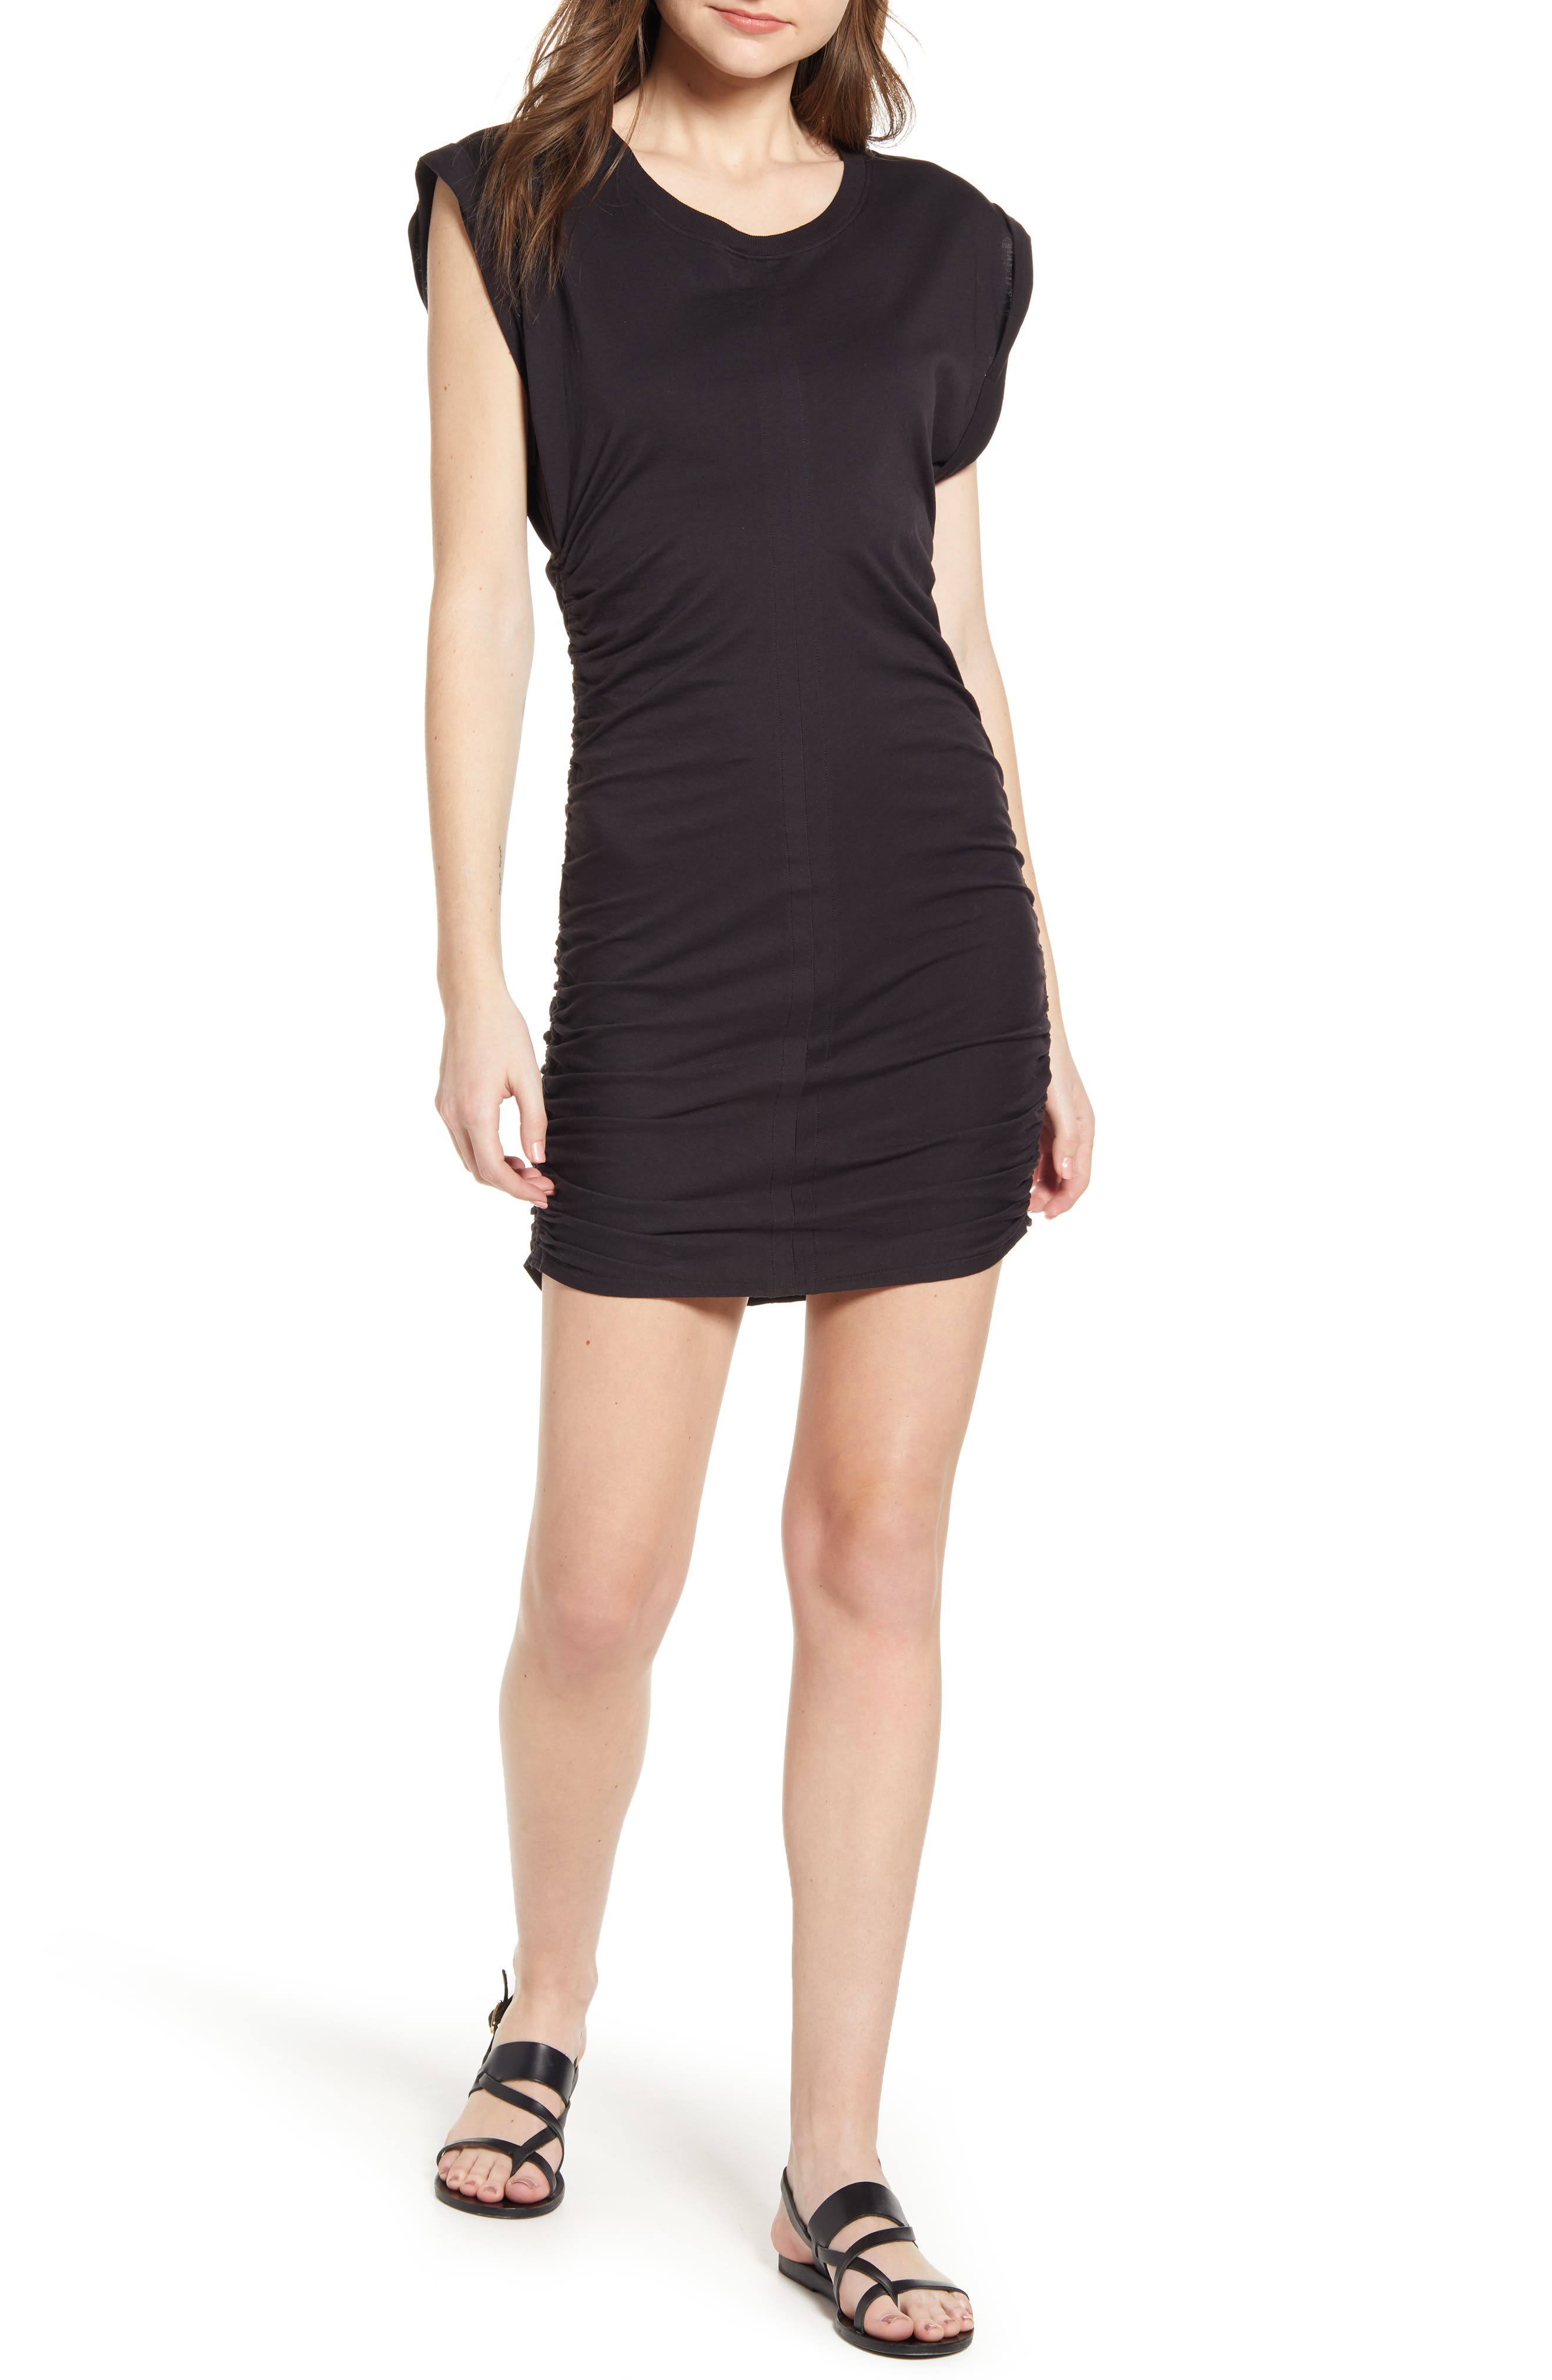 Splendid Ruched Jersey Minidress, Black